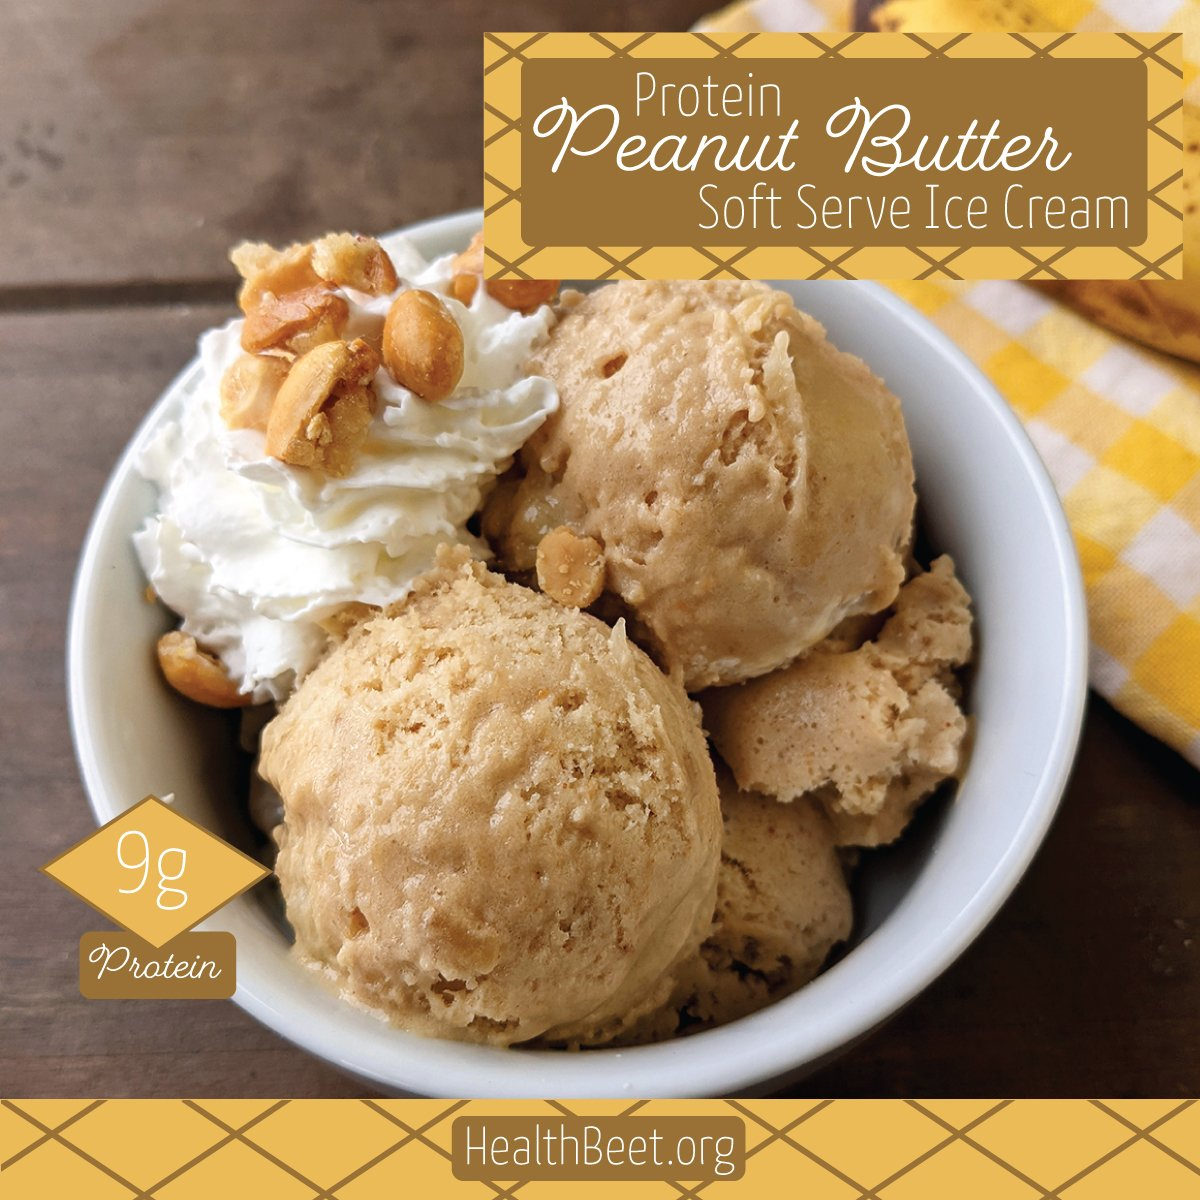 PB Ice Cream Cone Thumb 1200x1200